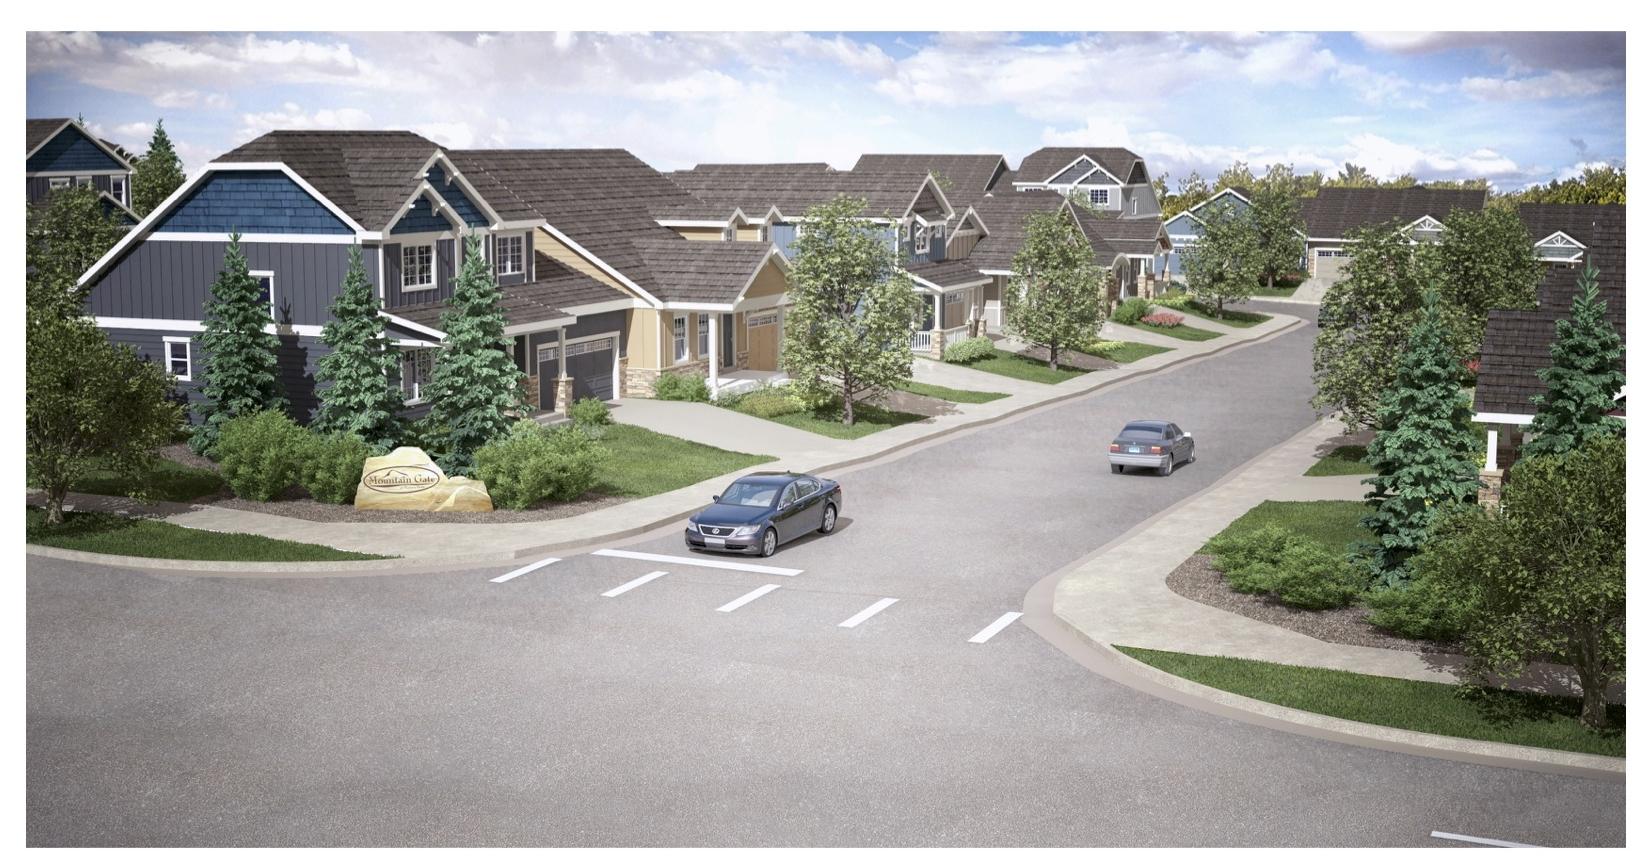 Loveland, Colorado, NOCO, Northern Colorado, NOCO HBA, Northern Colorado Home Builders Association, Remax, Development, New Construction, Custom Home, Interior Design, Design, Fort Collins, Savant Homes, Savant Homes Inc., Mountain Gate, Open House,